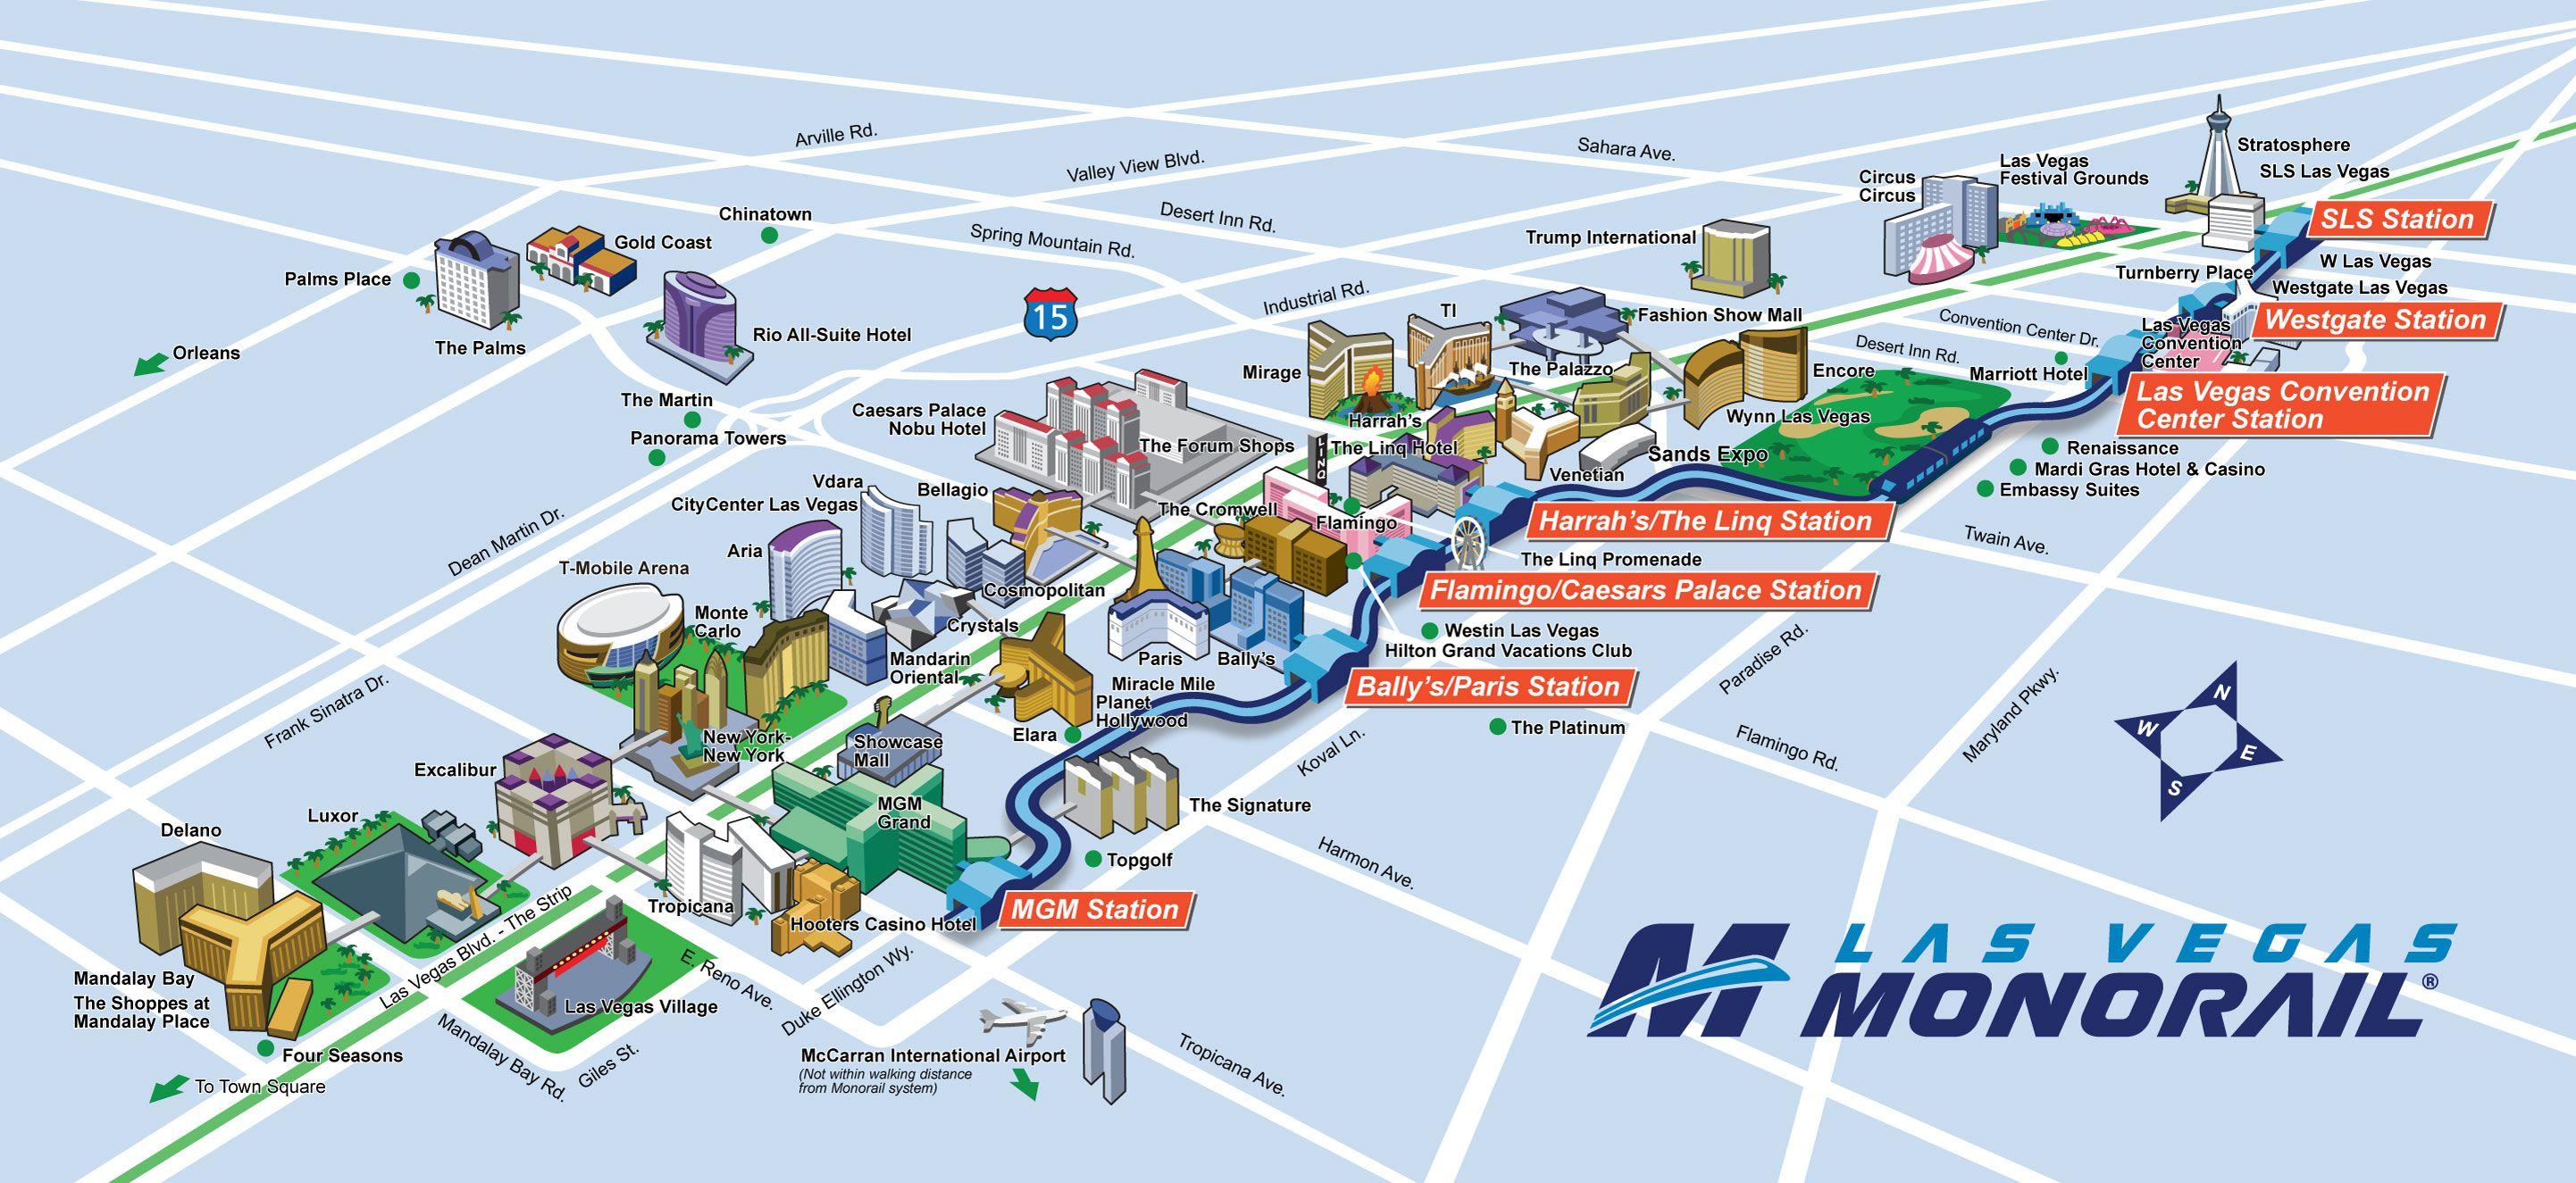 Monorail Las Vegas Map Route Map   Las Vegas Monorail | Las Vegas | Pinterest | Vegas  Monorail Las Vegas Map